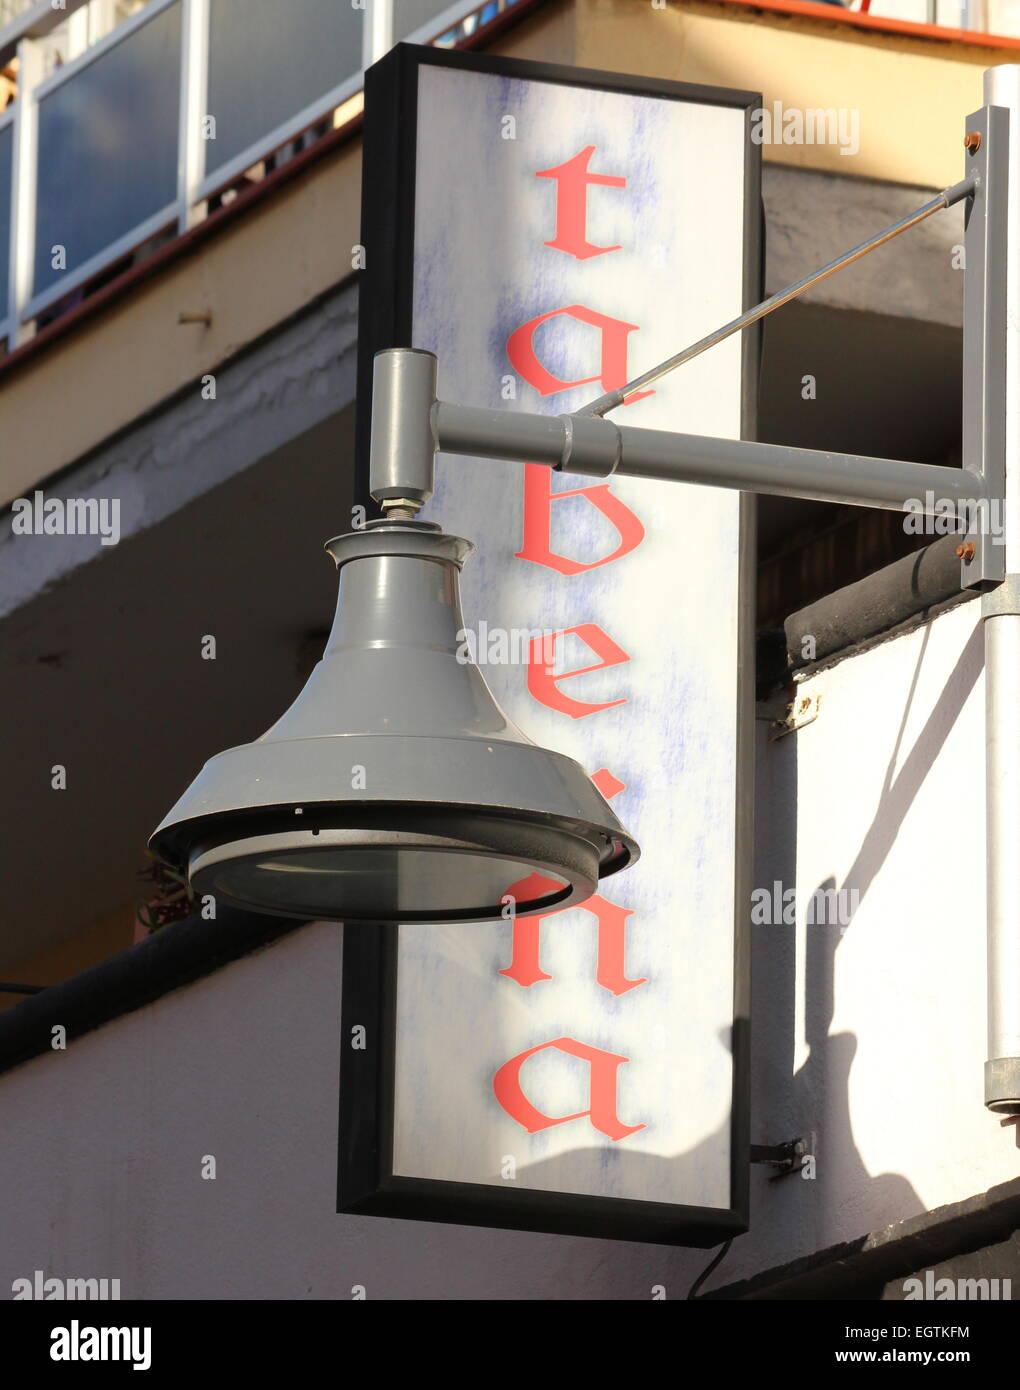 Taverna Taberna sign with streetlamp. Puerto de la cruz Tenerife spain - Stock Image